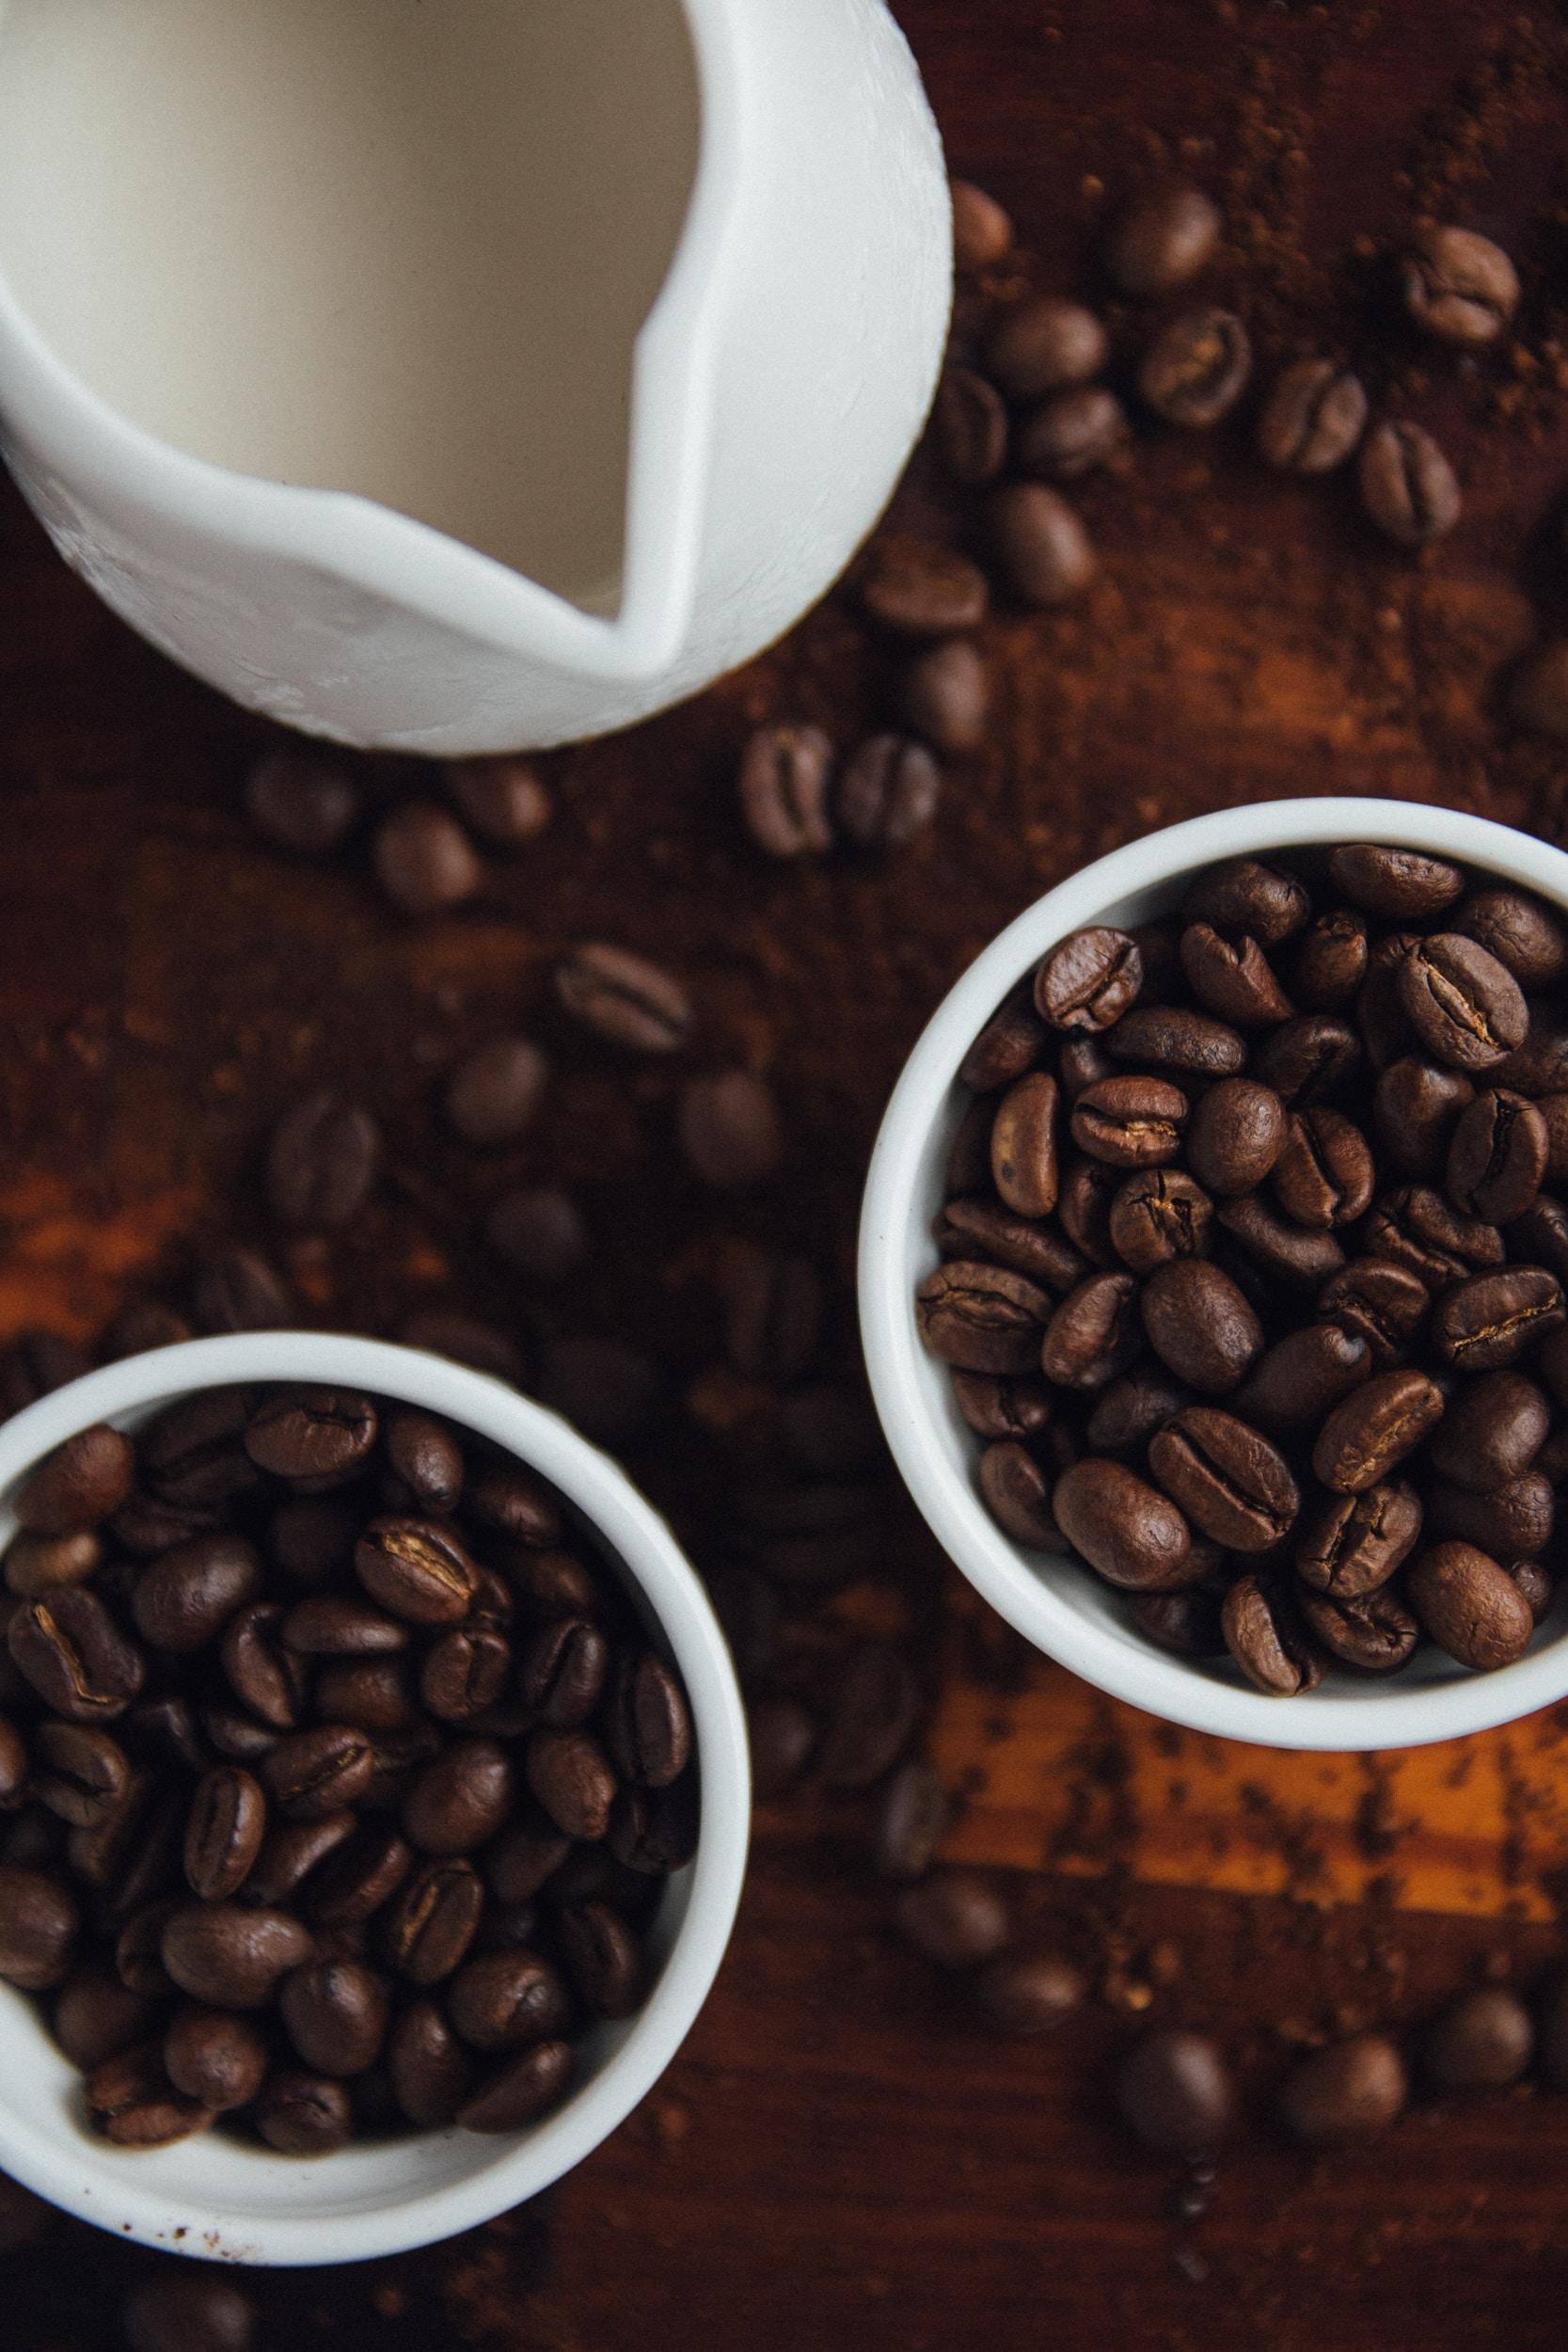 black coffee beans in ceramic mugs